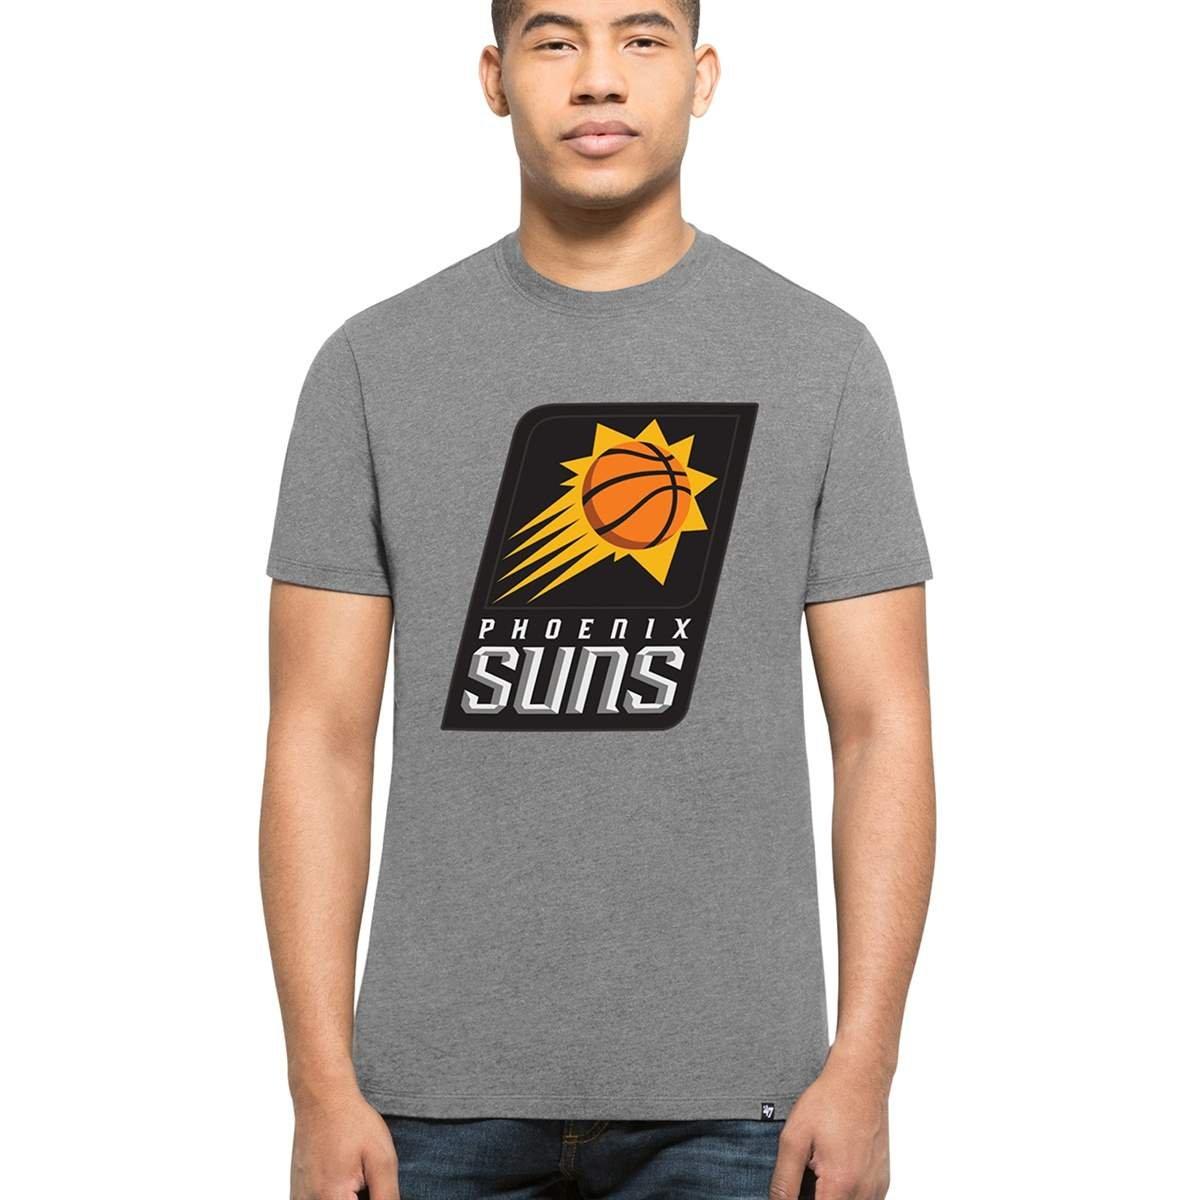 '47 Brand Phoenix Suns Club NBA T-Shirt Grau '47 Brand